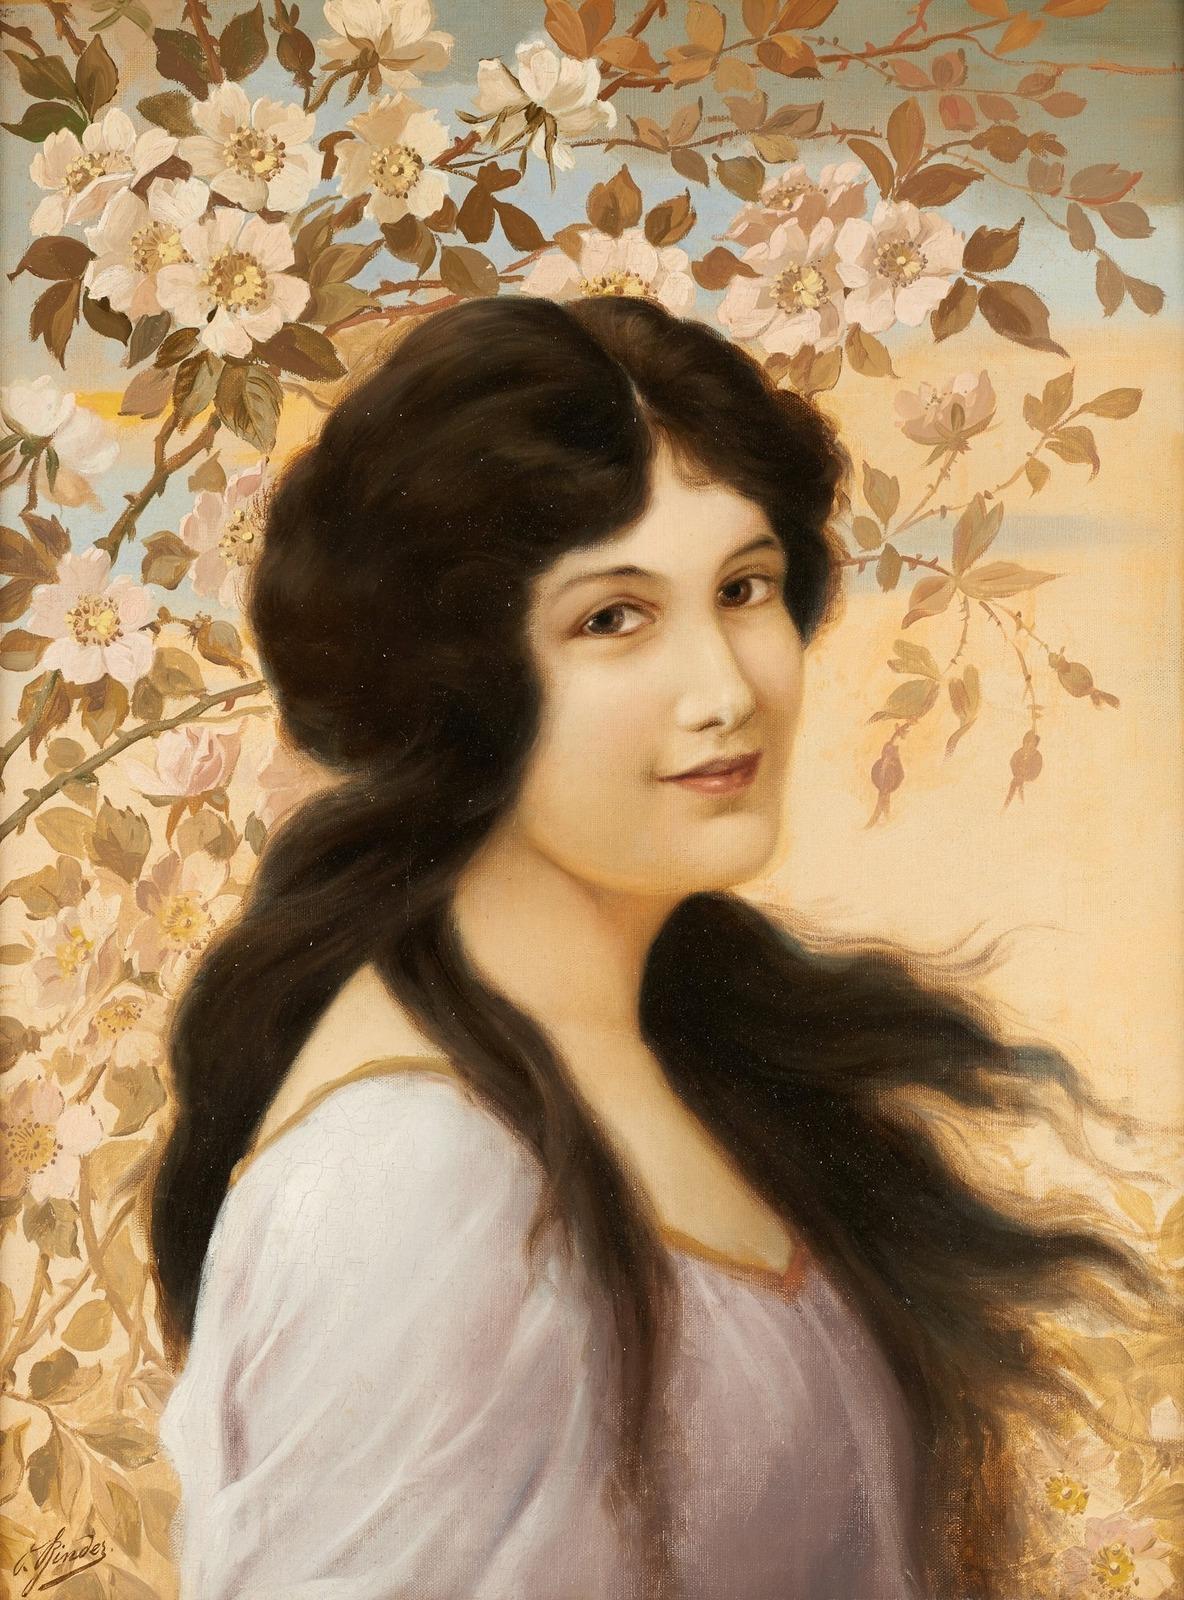 Alois Binder, 1857-1933_Девушка на ветру (Jeune fille dans le vent)_61 х 36_х.,м._Частное собрание.jpg